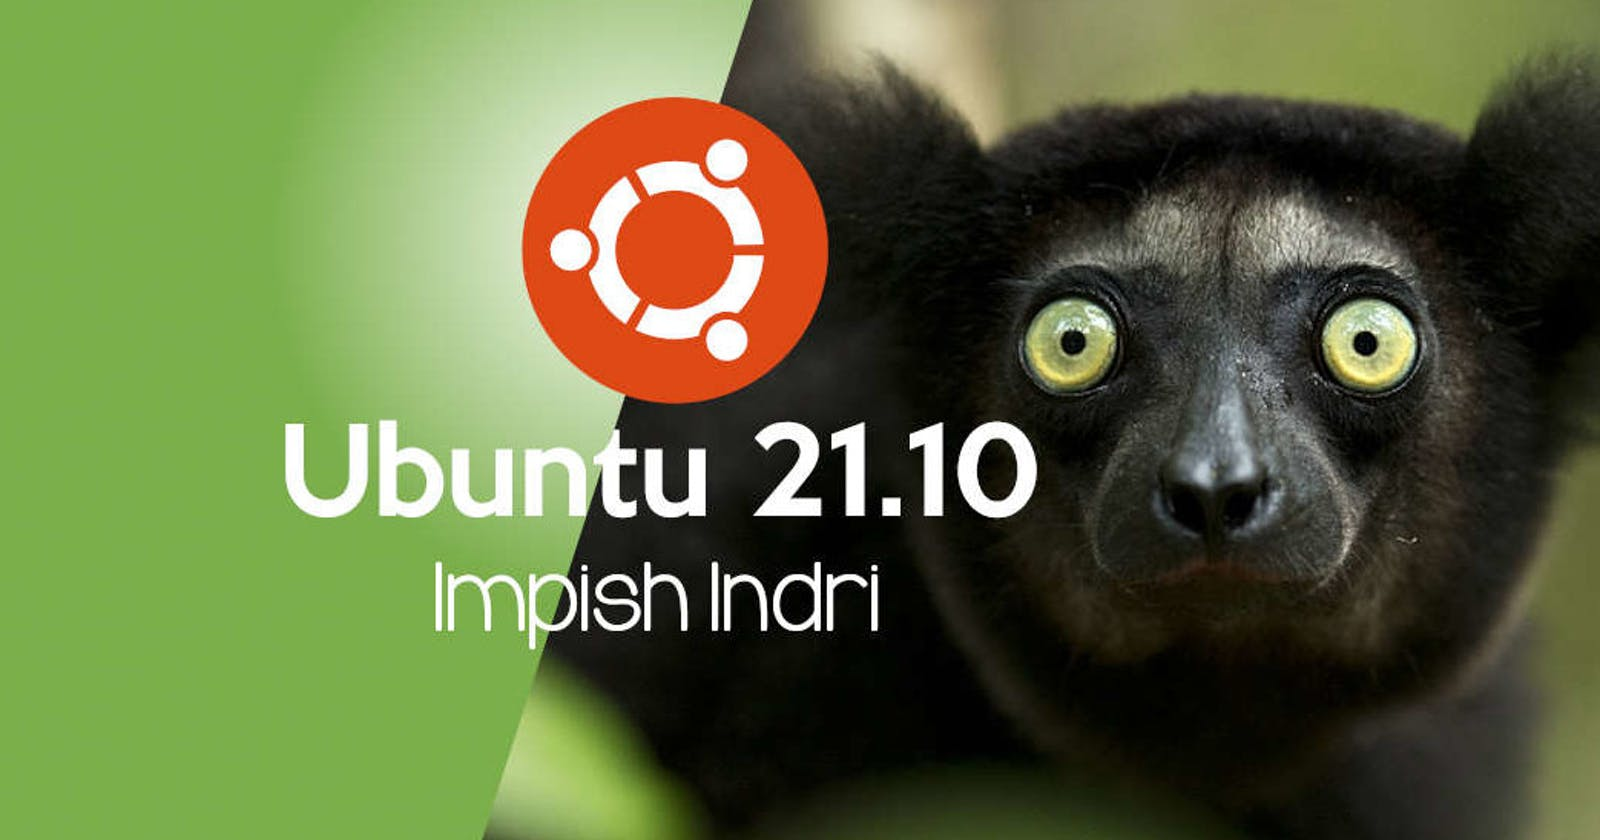 Ubuntu doesn't start graphic UI with Ryzen 3000 series